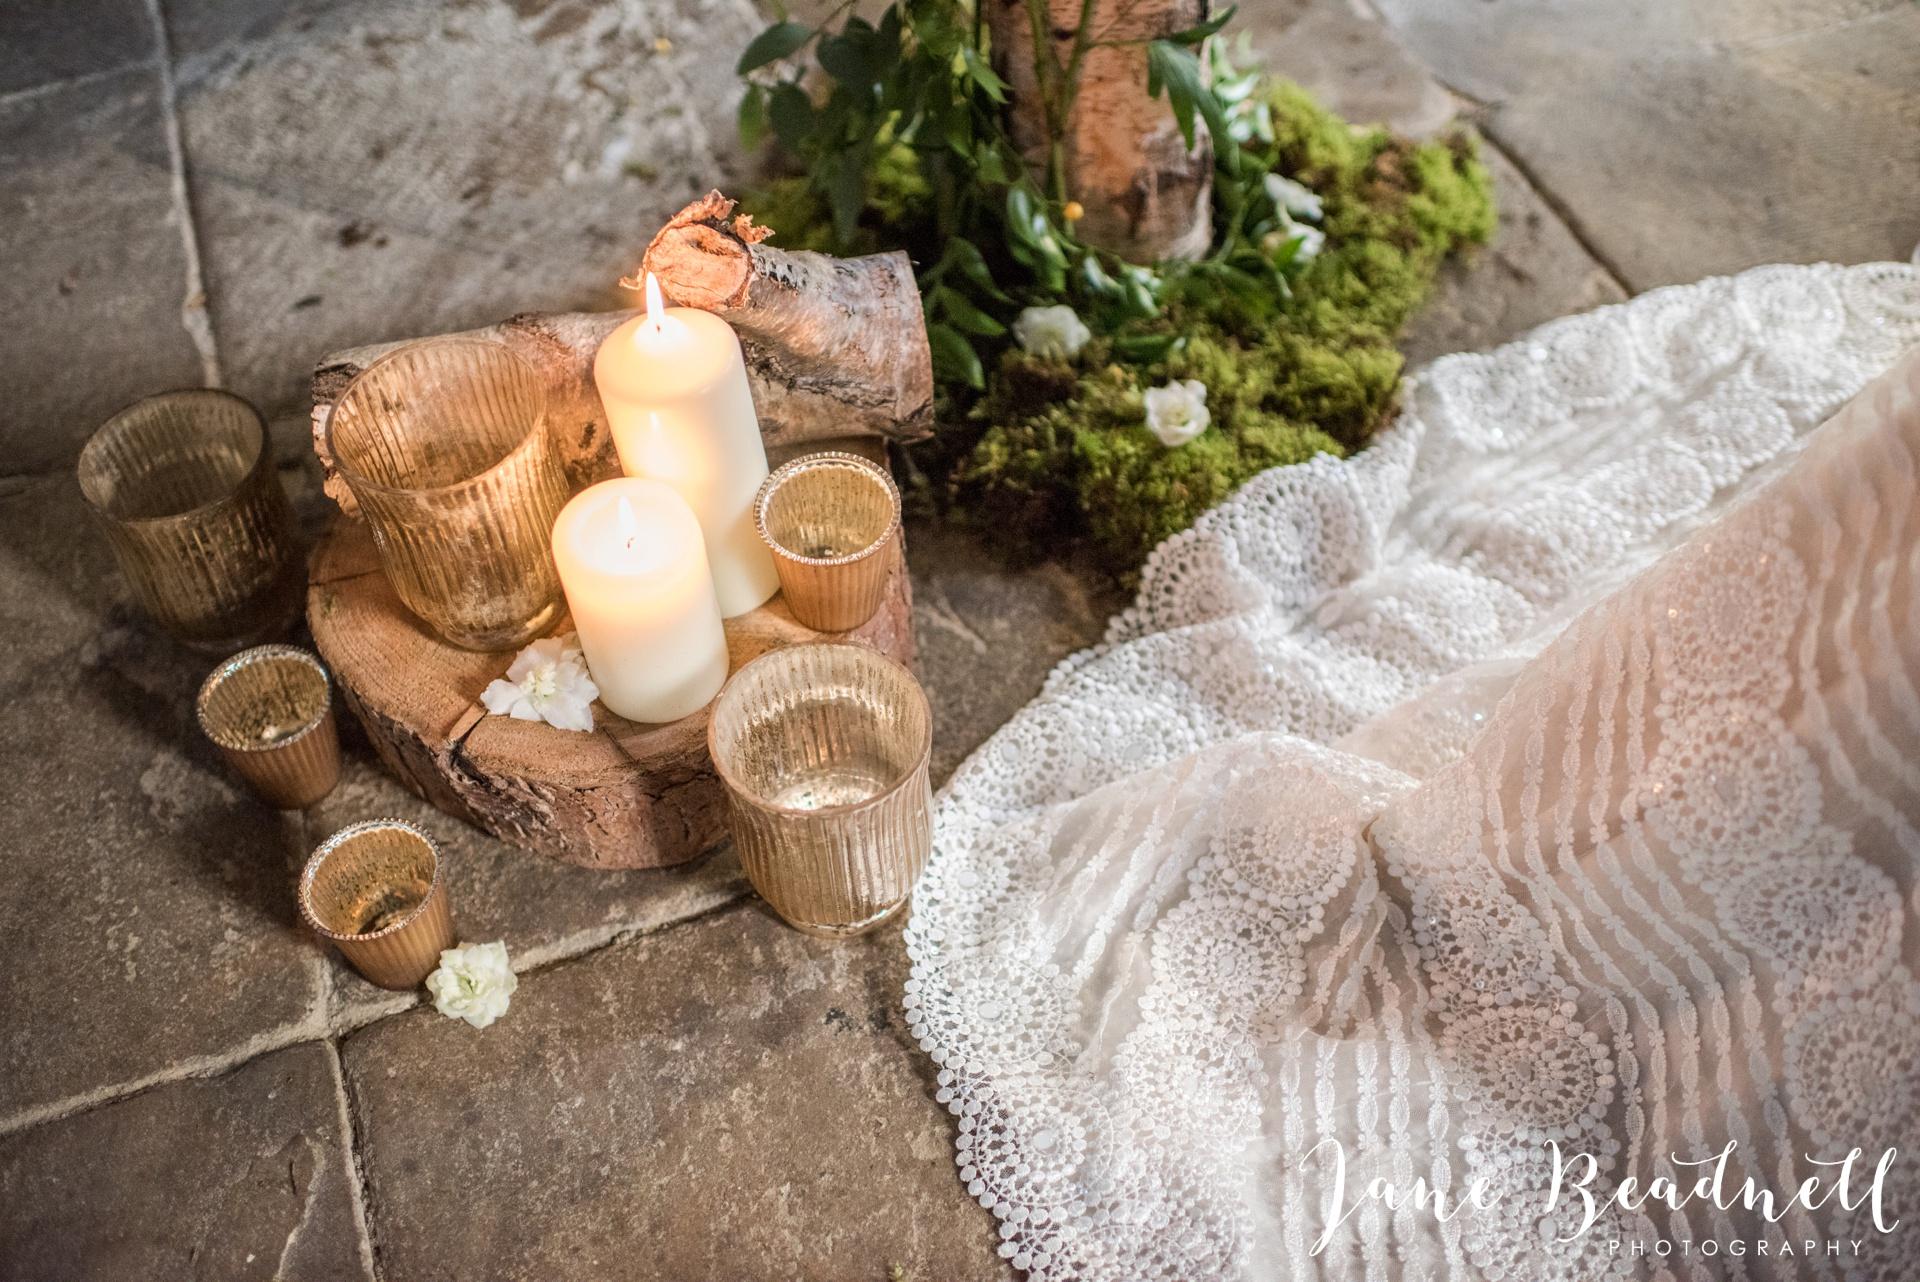 leafy-couture-wedding-flowers-otley-fine-art-wedding-photographer-jane-beadnell-photography_0031